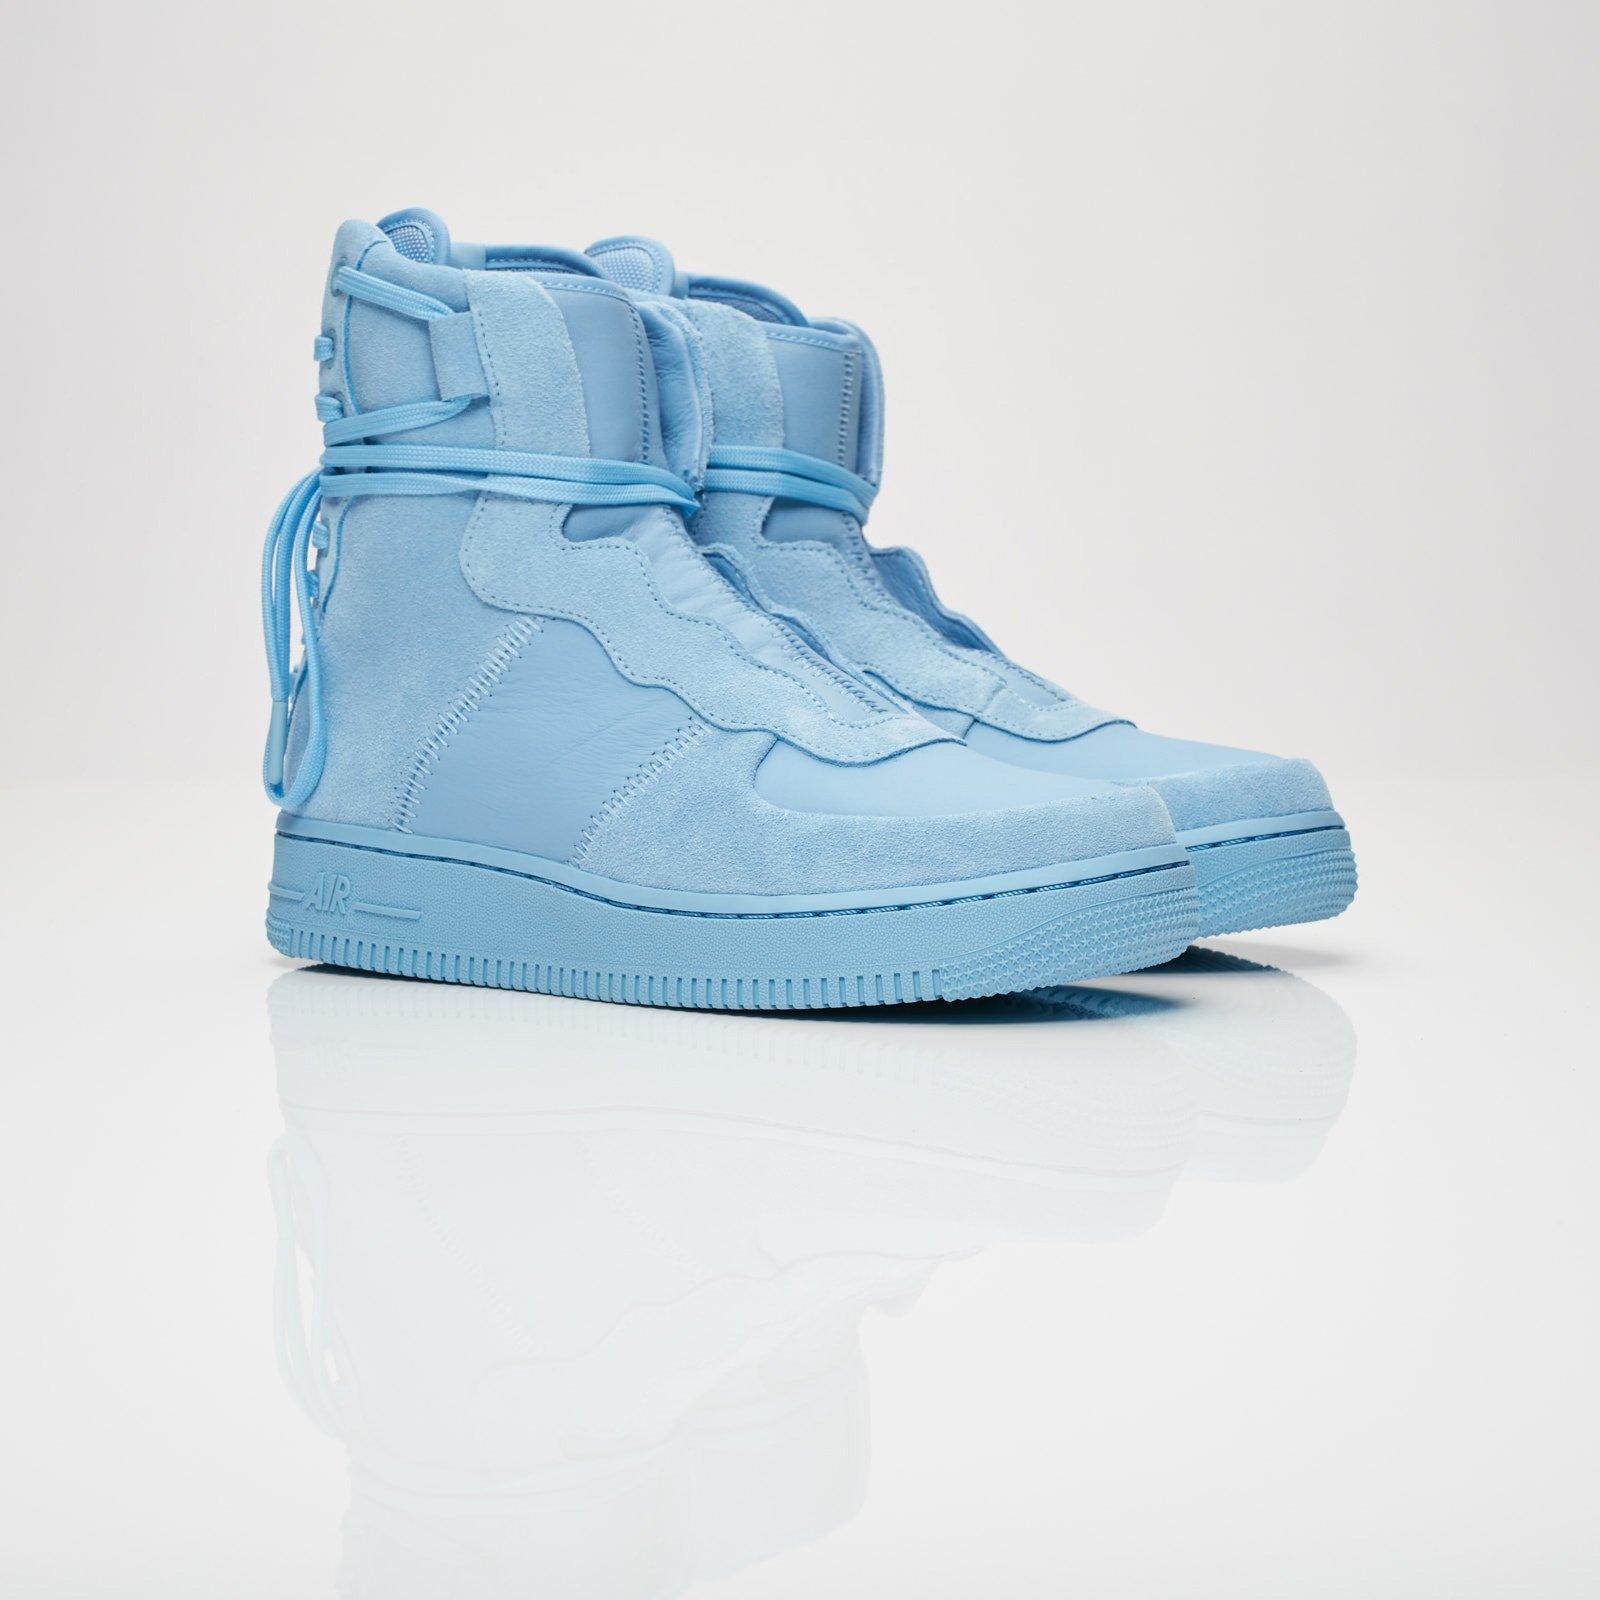 e8d096f9ca09 Nike Wmns Air Force 1 Rebel XX - Ao1525-400 - Sneakersnstuff ...